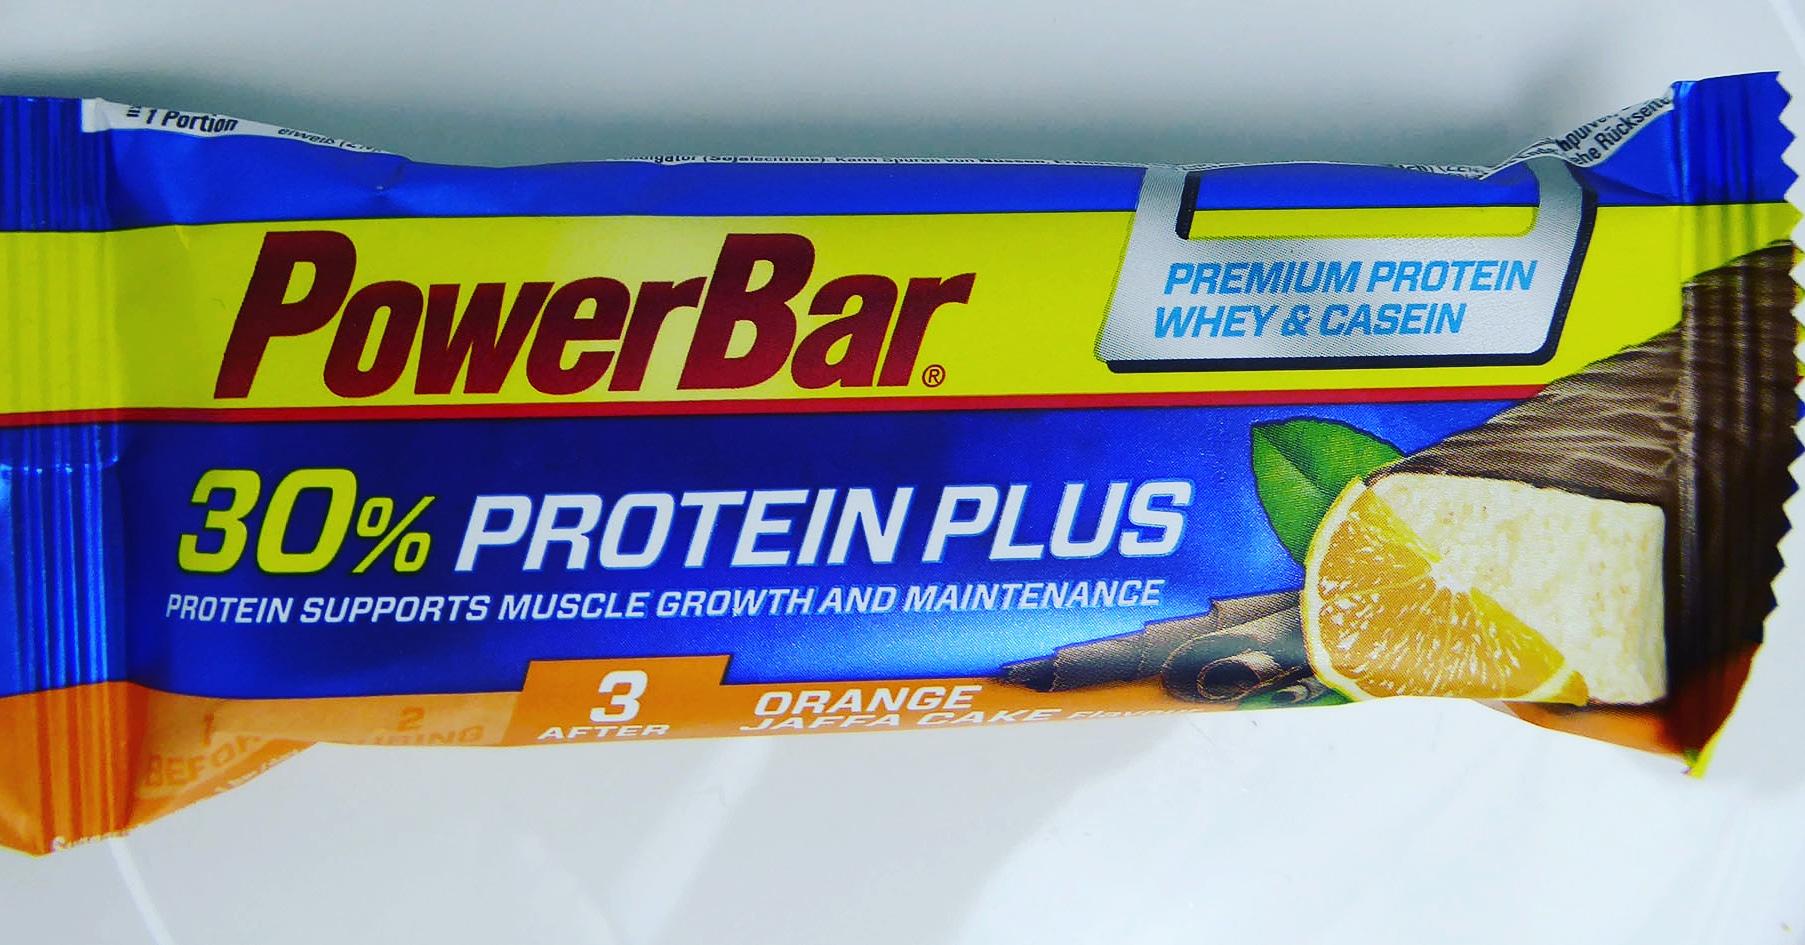 PowerBar Power Bar Jaffa Cake Orange Protein Bar Proteinbar Proteinriegel Eiweißriegel